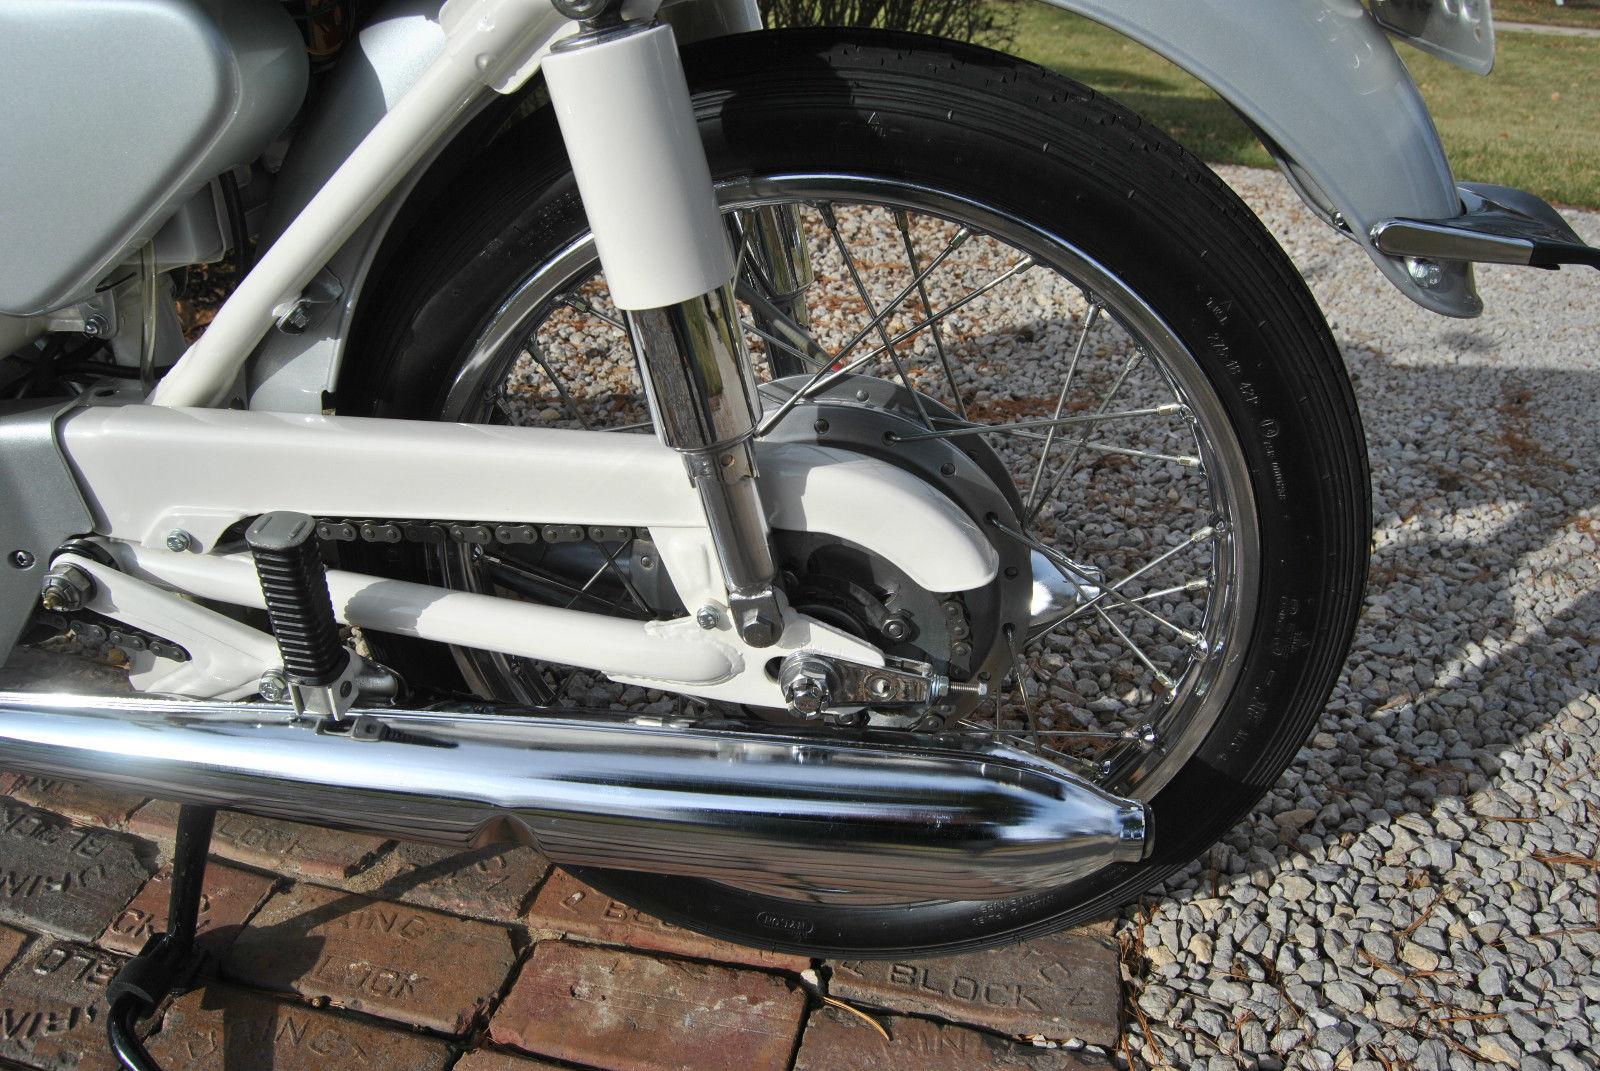 Honda CB160 Sport - 1969 - Muffler, Swing Arm and Chain Guard.